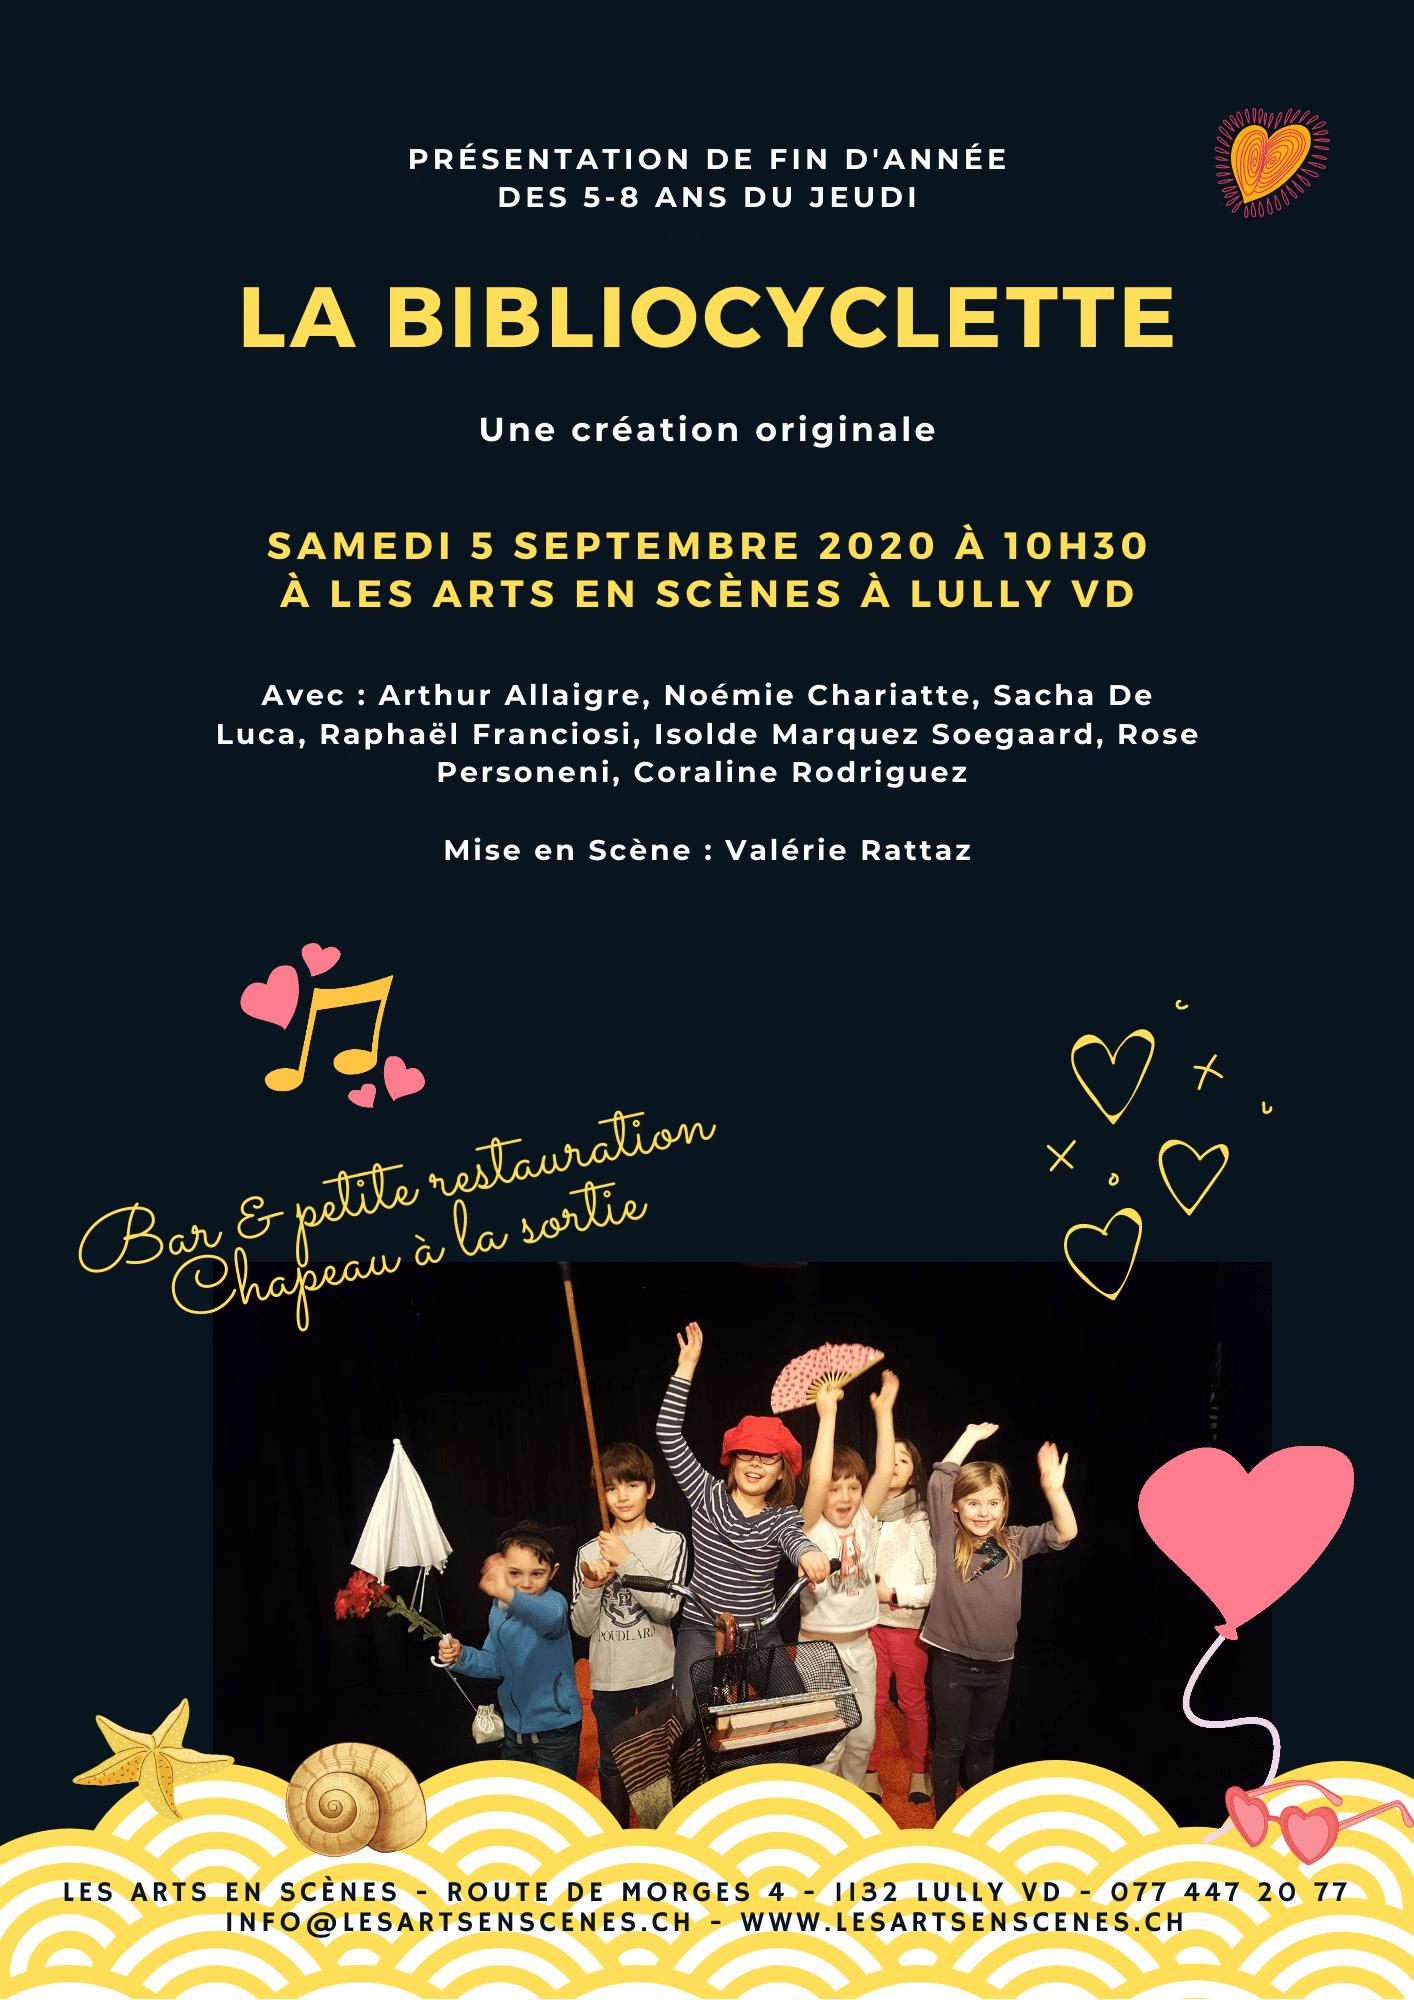 La Bibliocyclette